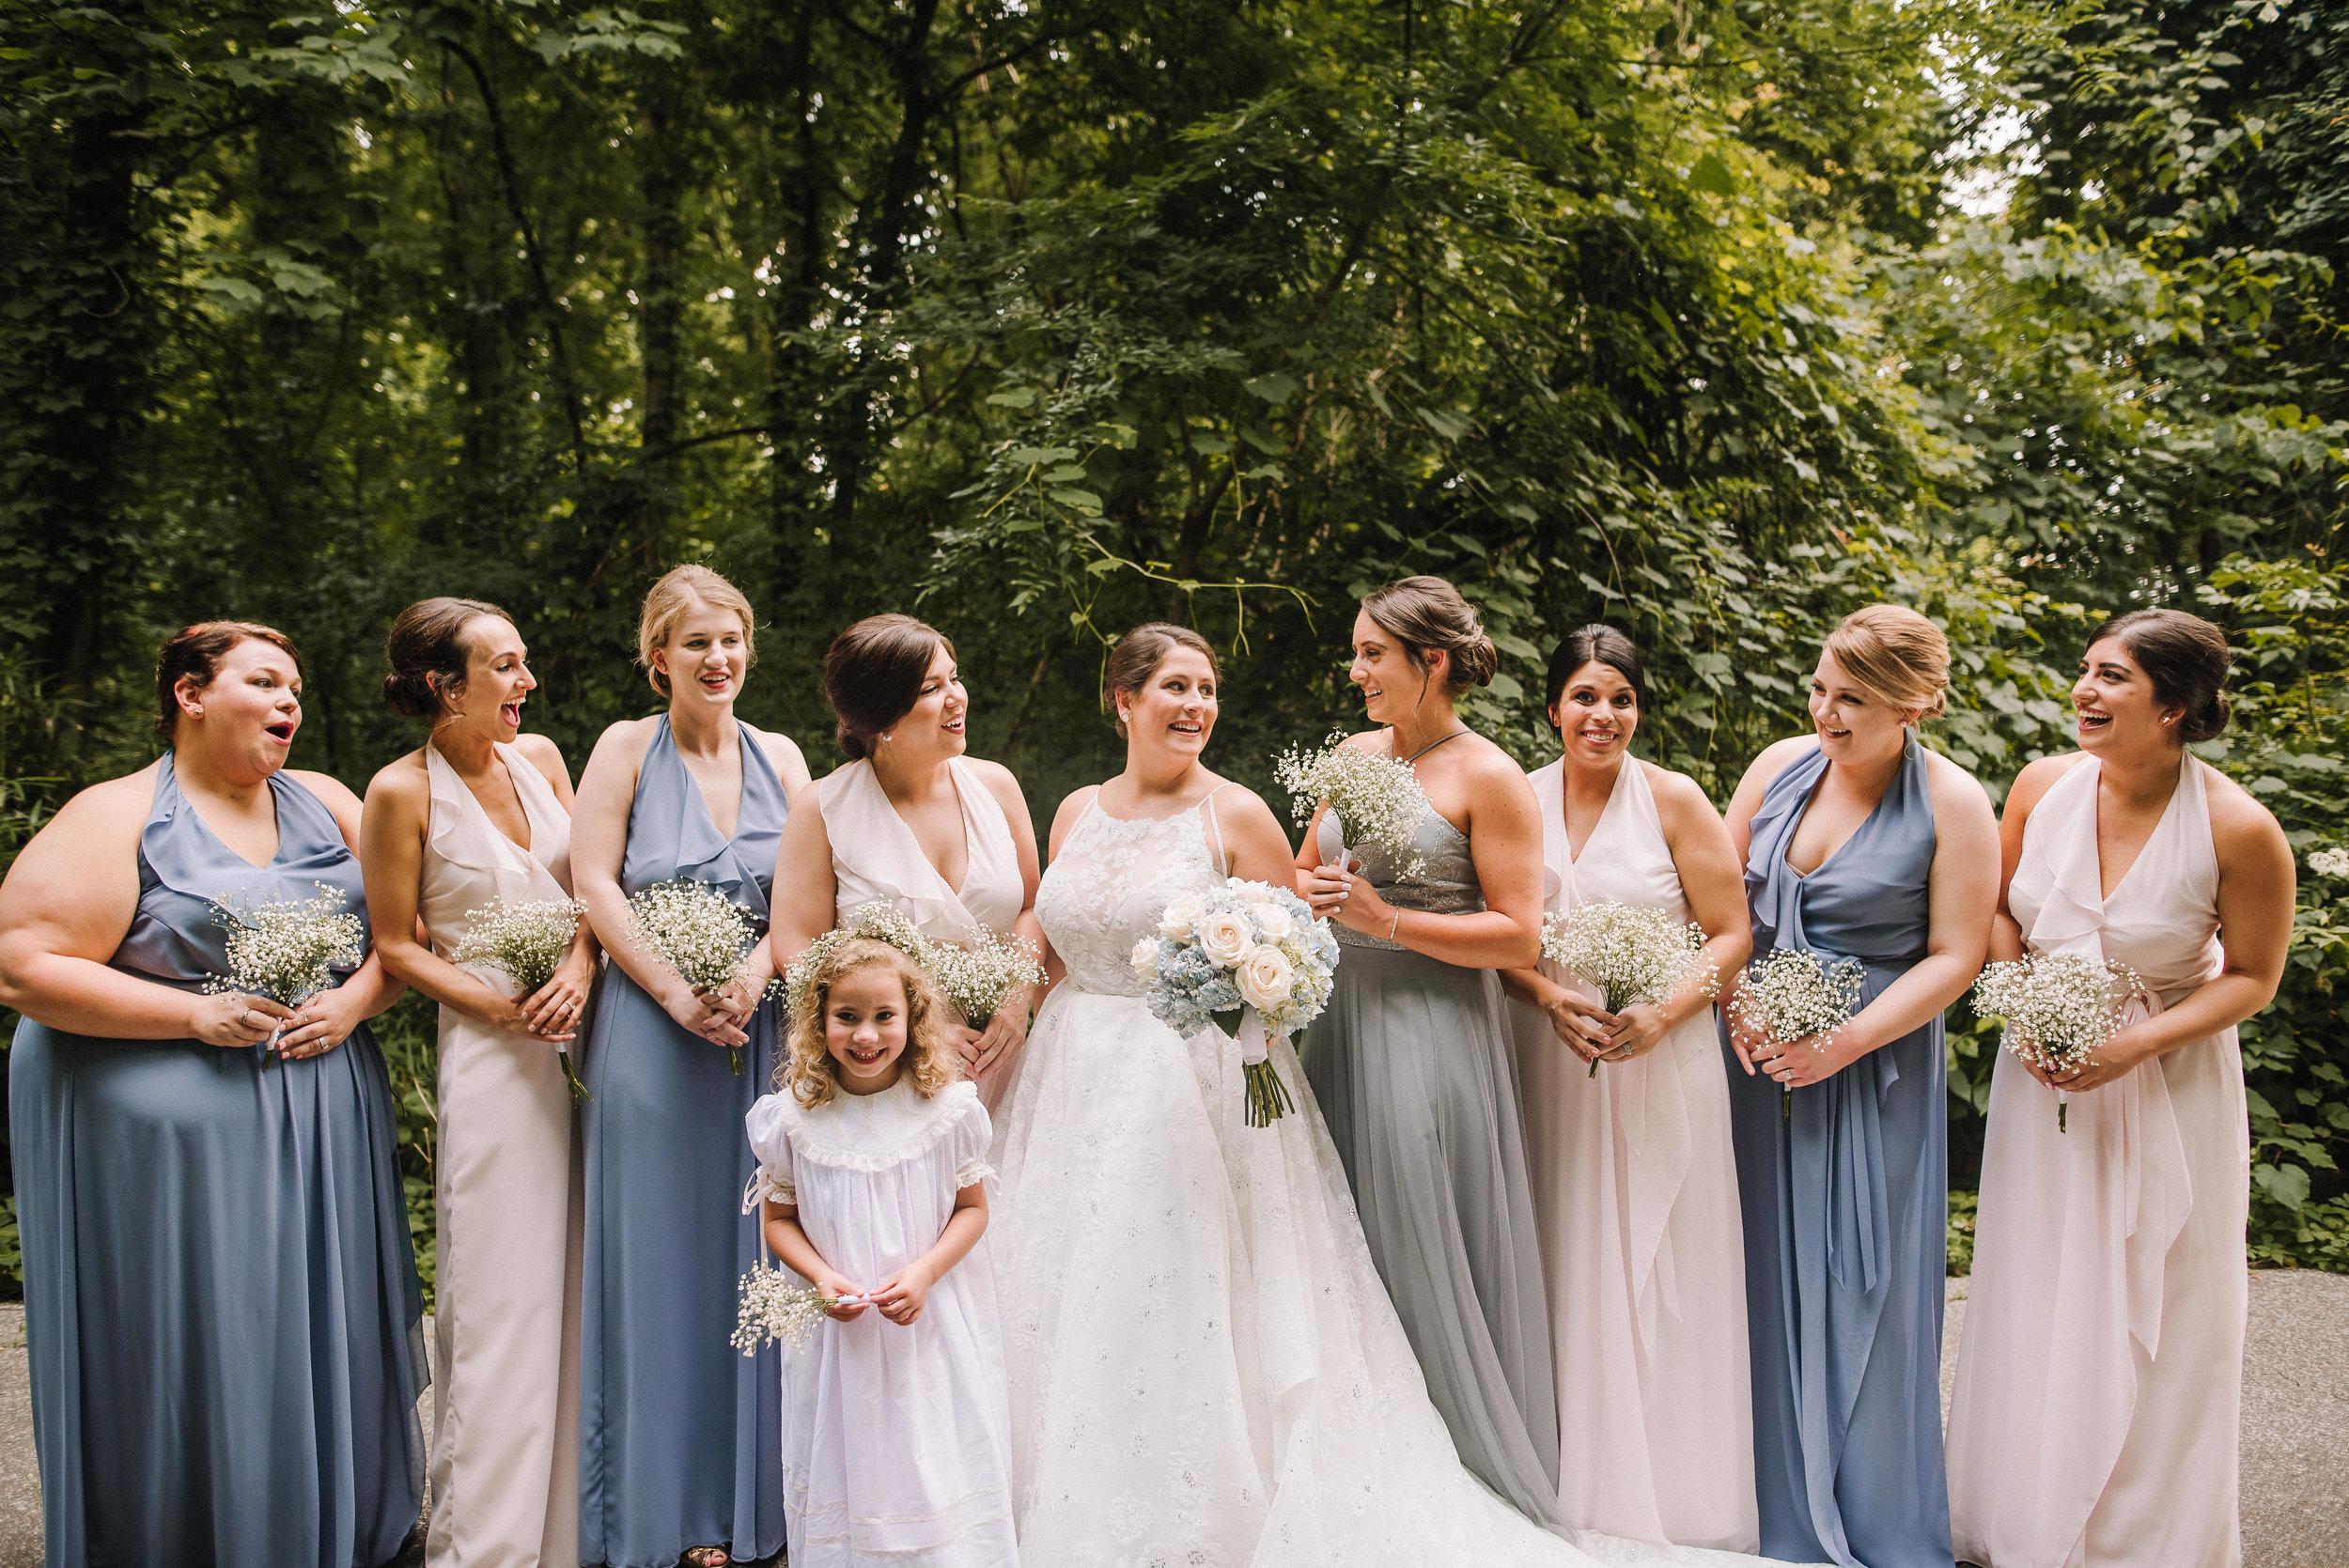 Smith Wedding_Memphis Zoo_Ashley Benham Photography-369.jpg